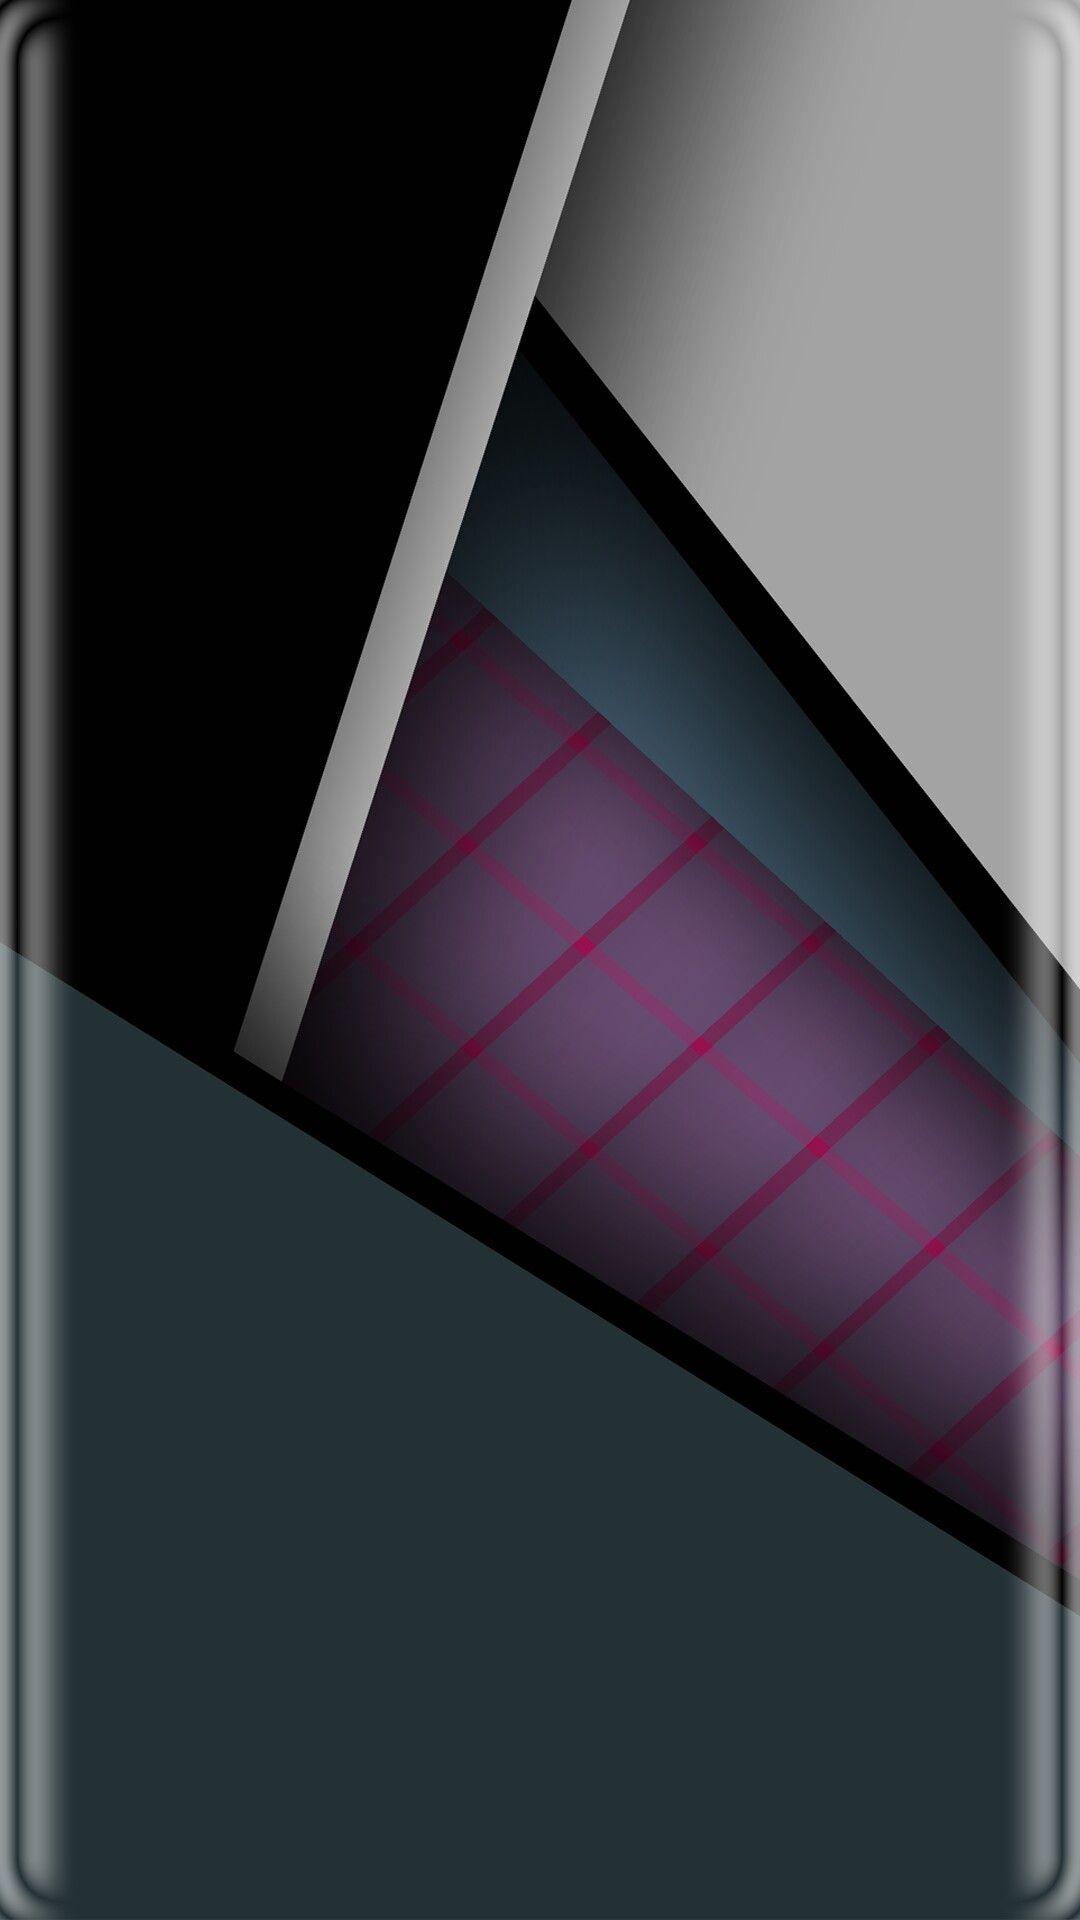 Samsung Iphone Edge Phone Telefon 3d Wallpaper Samsung Wallpaper Backgrounds Phone Wallpapers Colorful Wallpaper